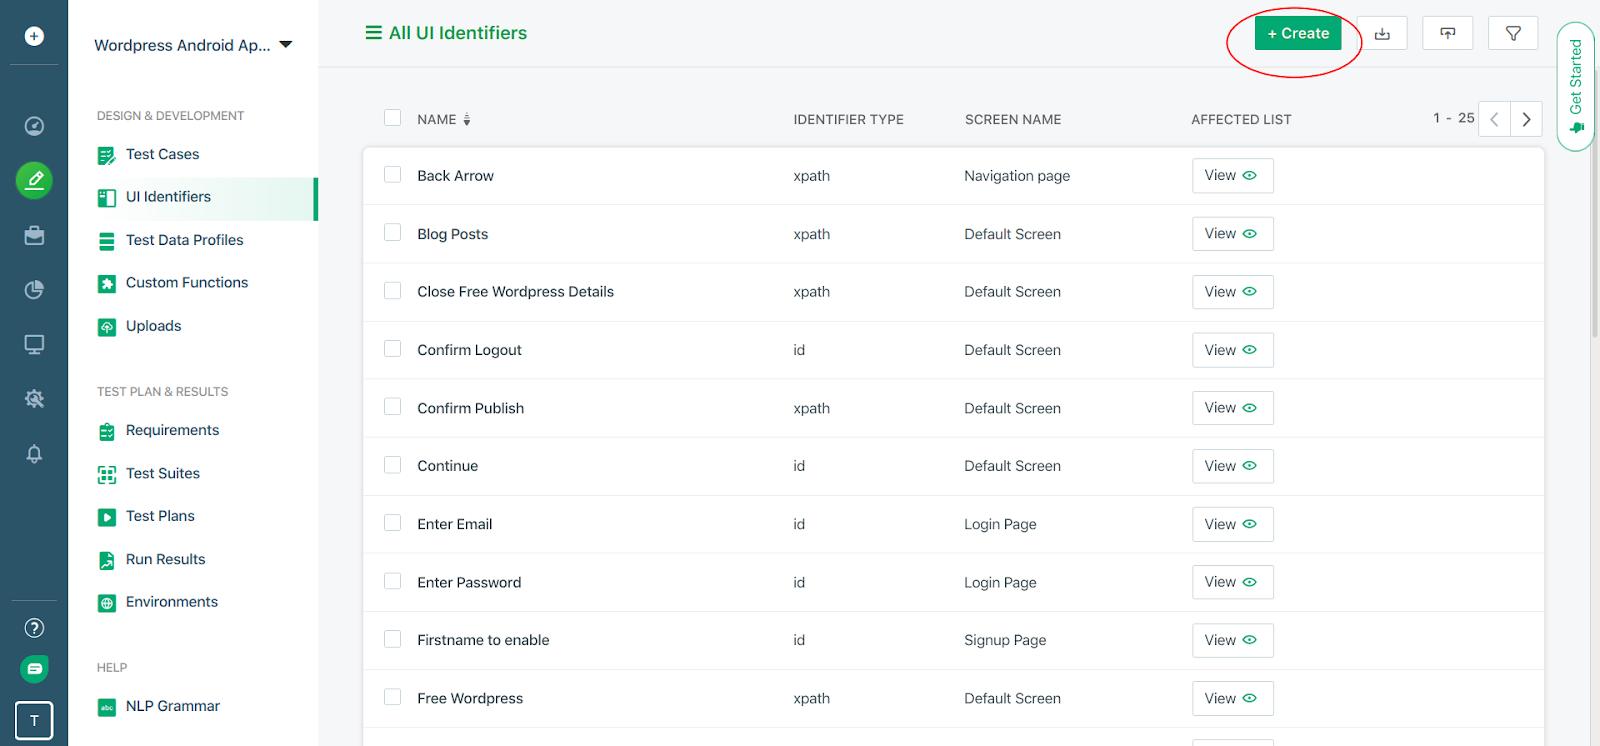 UI Identifiers page